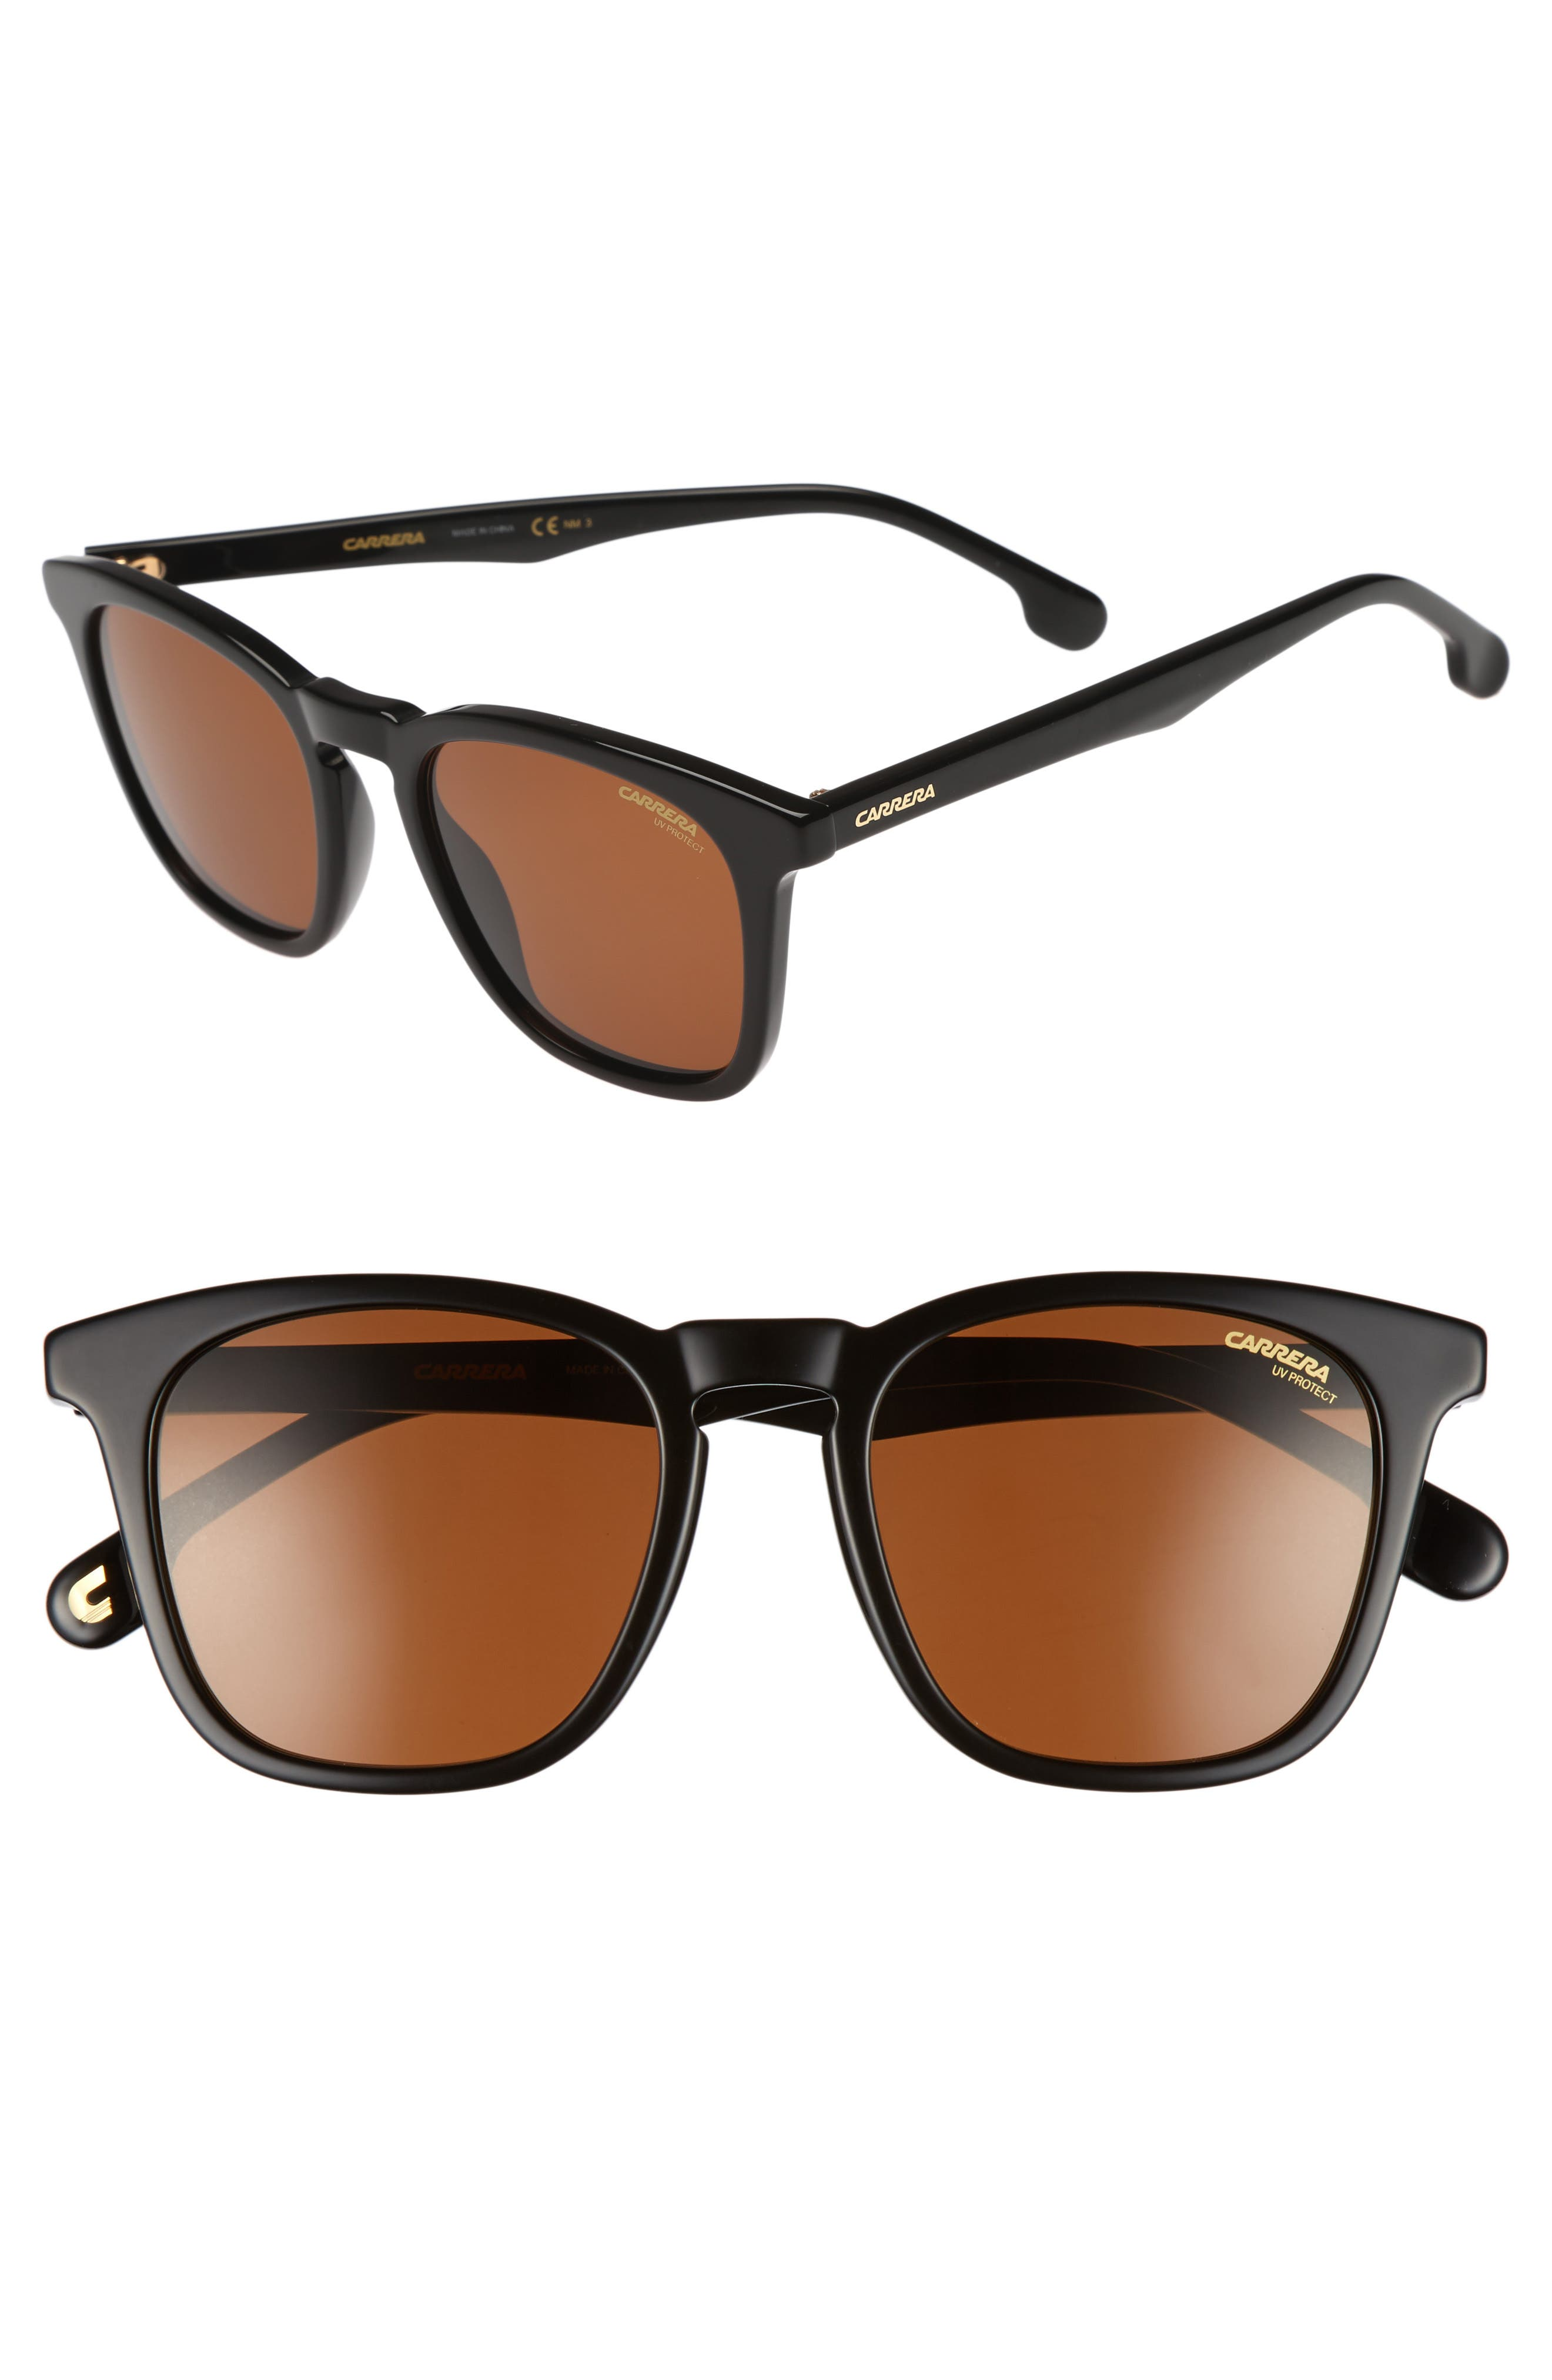 Carrera 143S 51mm Sunglasses,                             Main thumbnail 1, color,                             BLACK/ BROWN